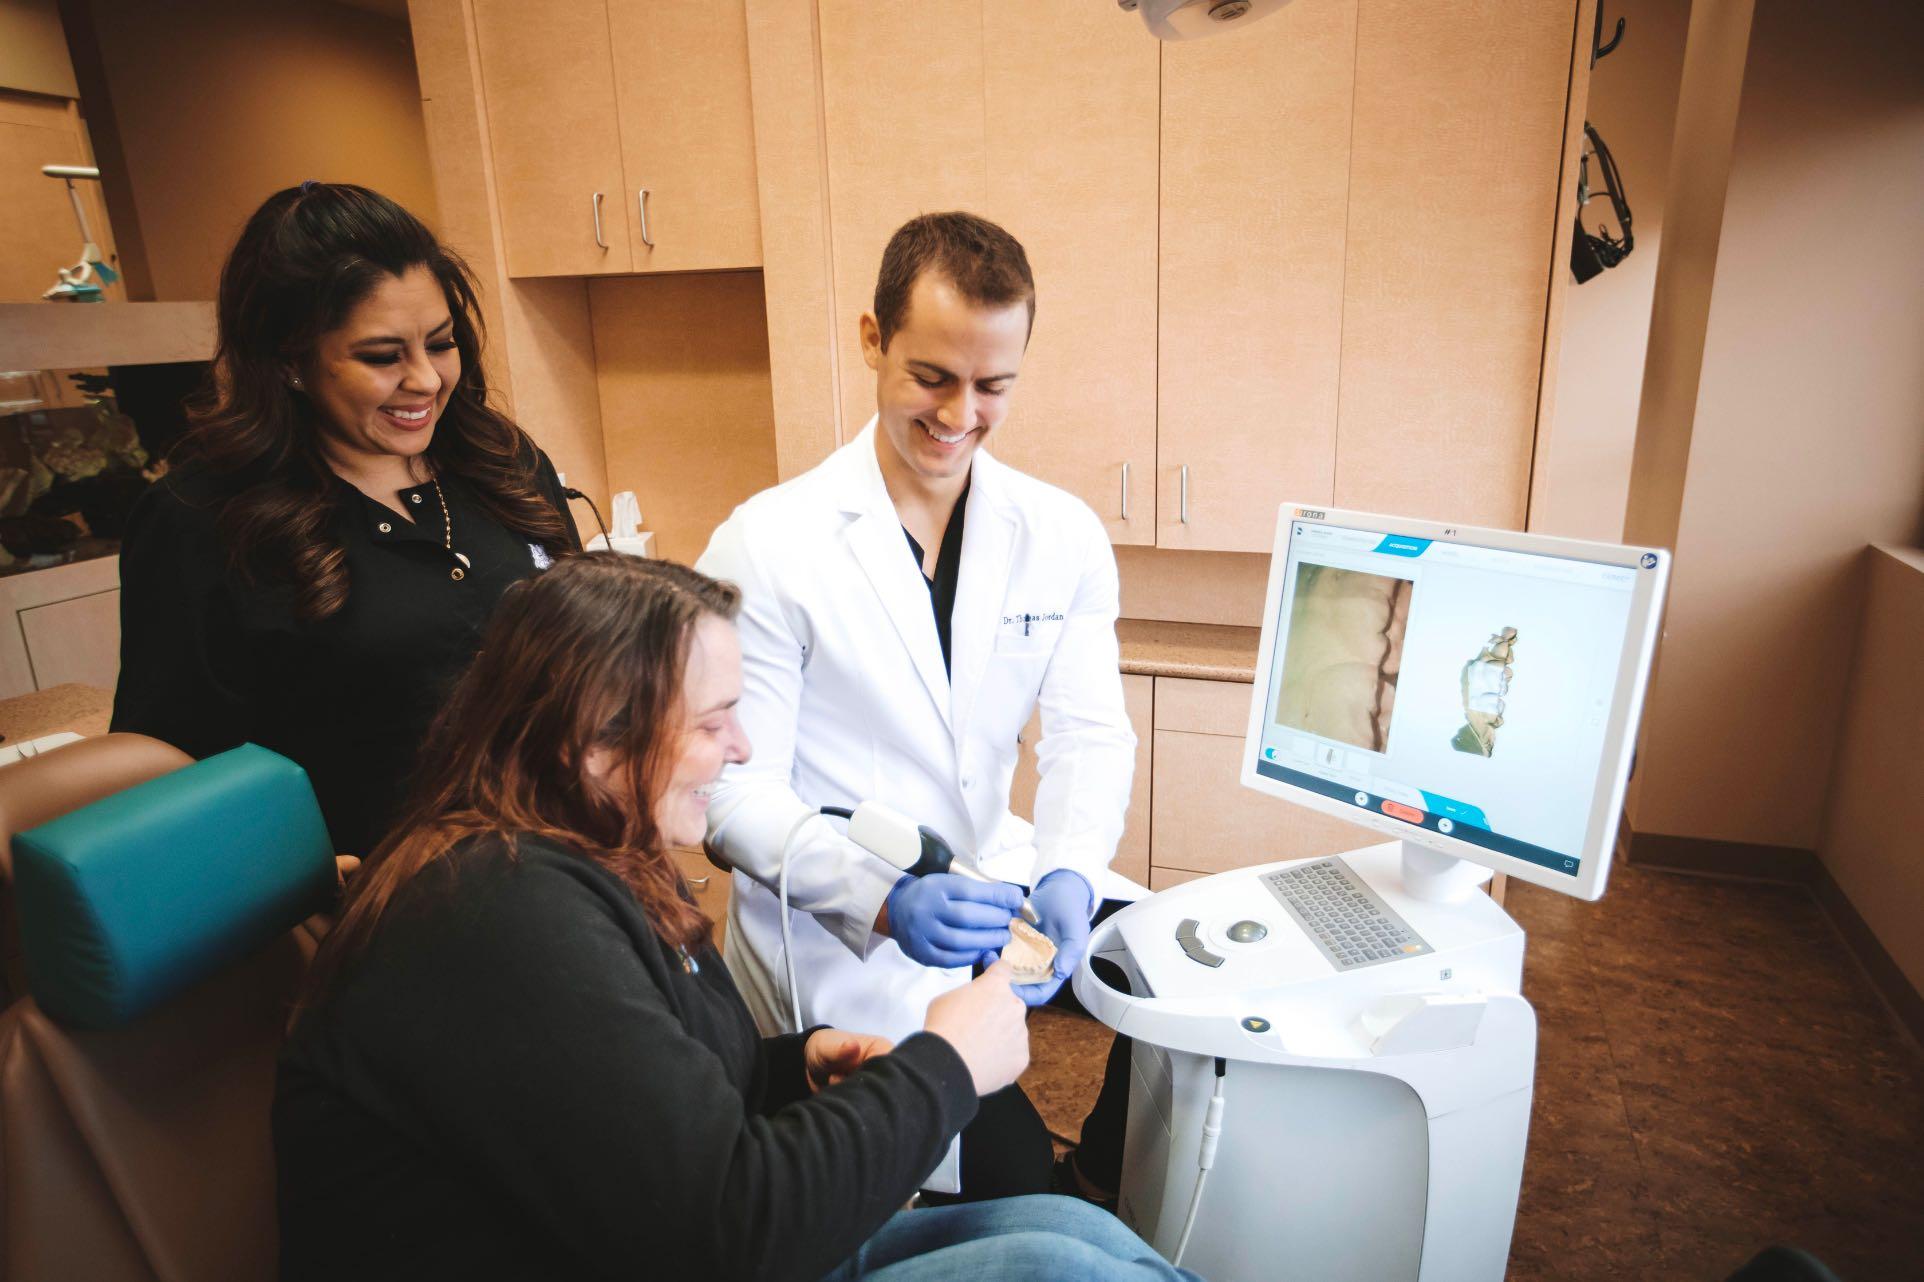 Photo of Dr. Jordan using a 3-D dental scanner